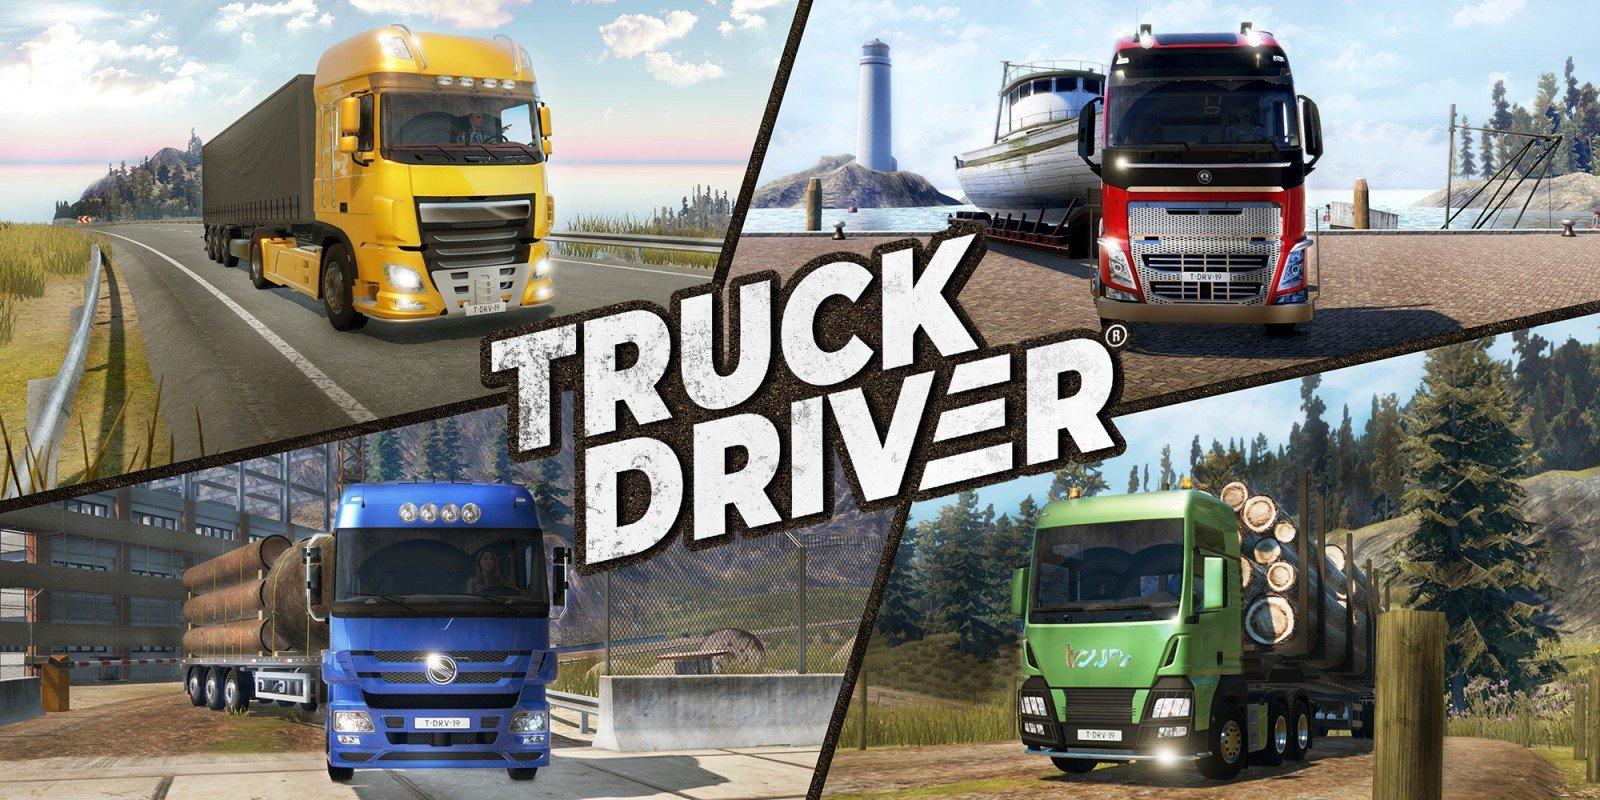 H2x1_NSwitch_TruckDriver_image1600w.jpg